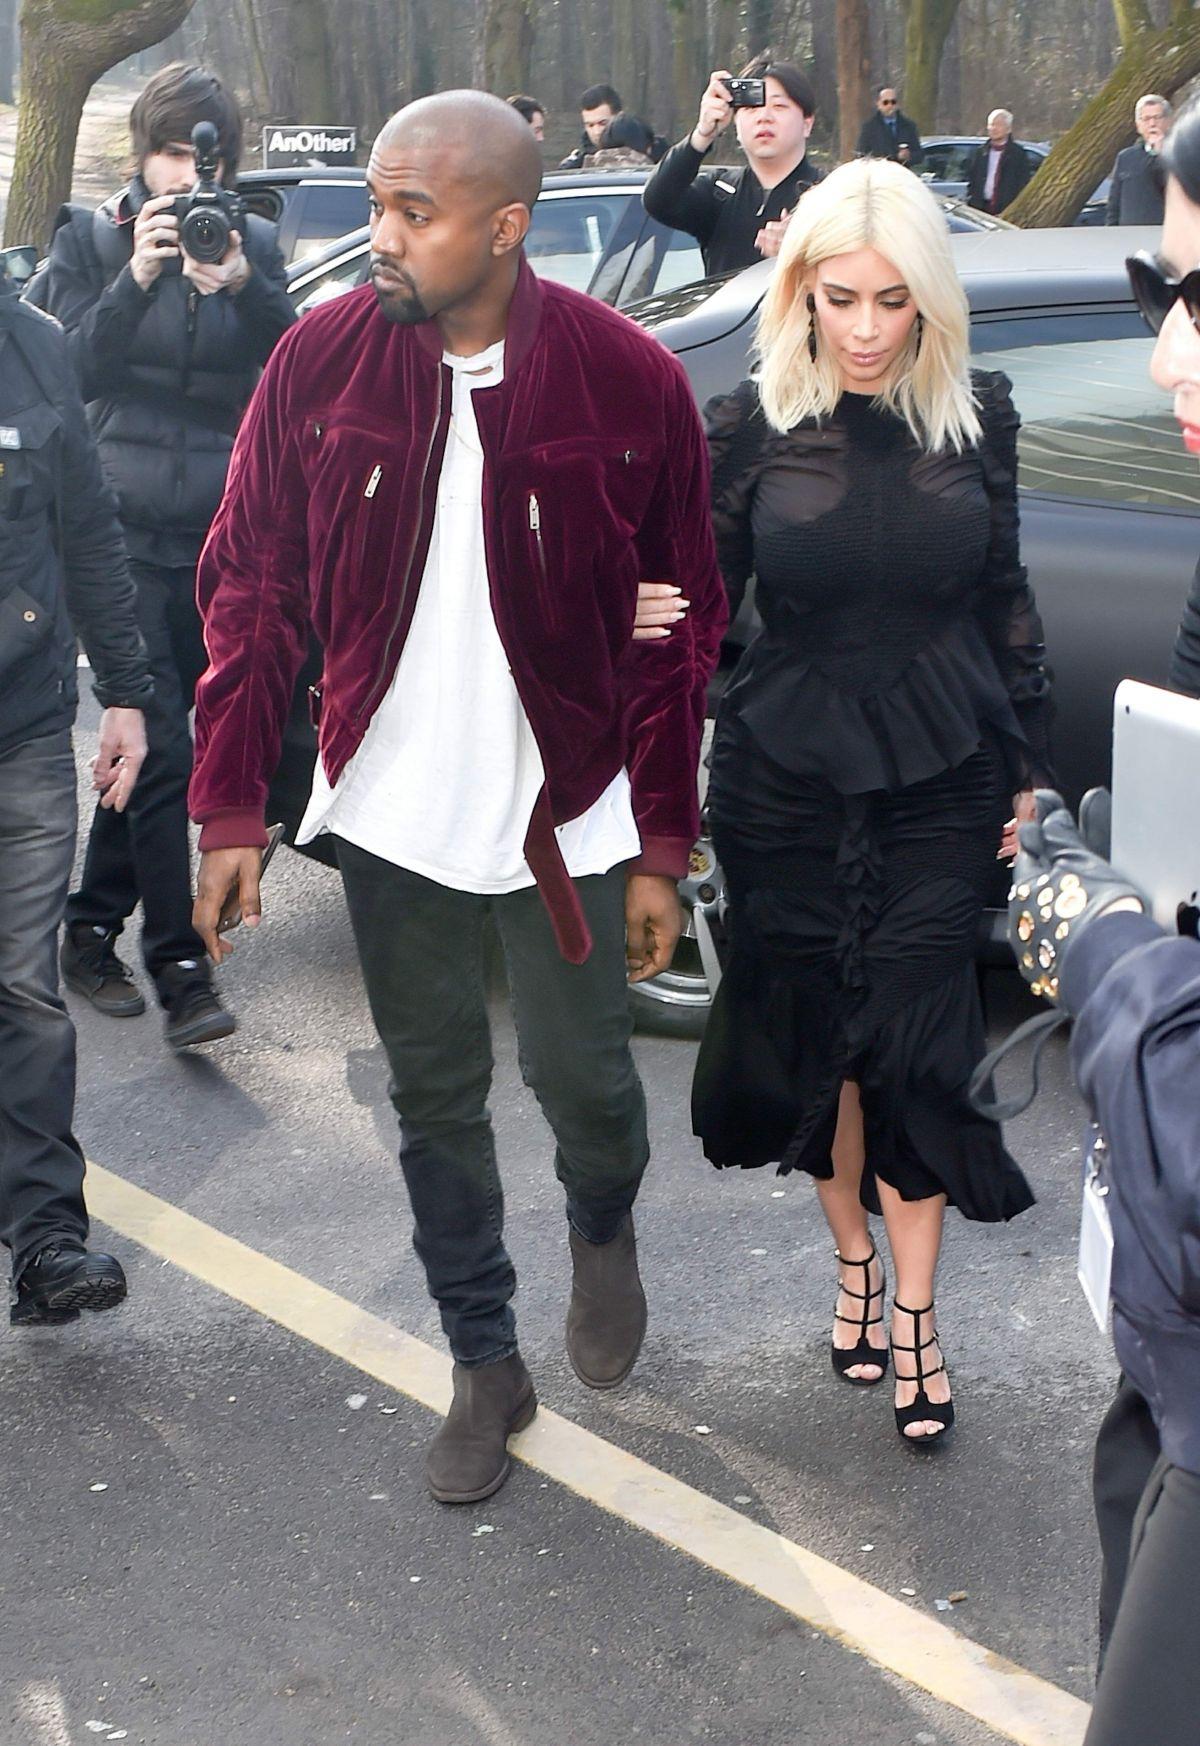 KIM KARDASHIAN and Kanye West at Louis Vuitton Fashion Show in Paris ... 3978d661a9